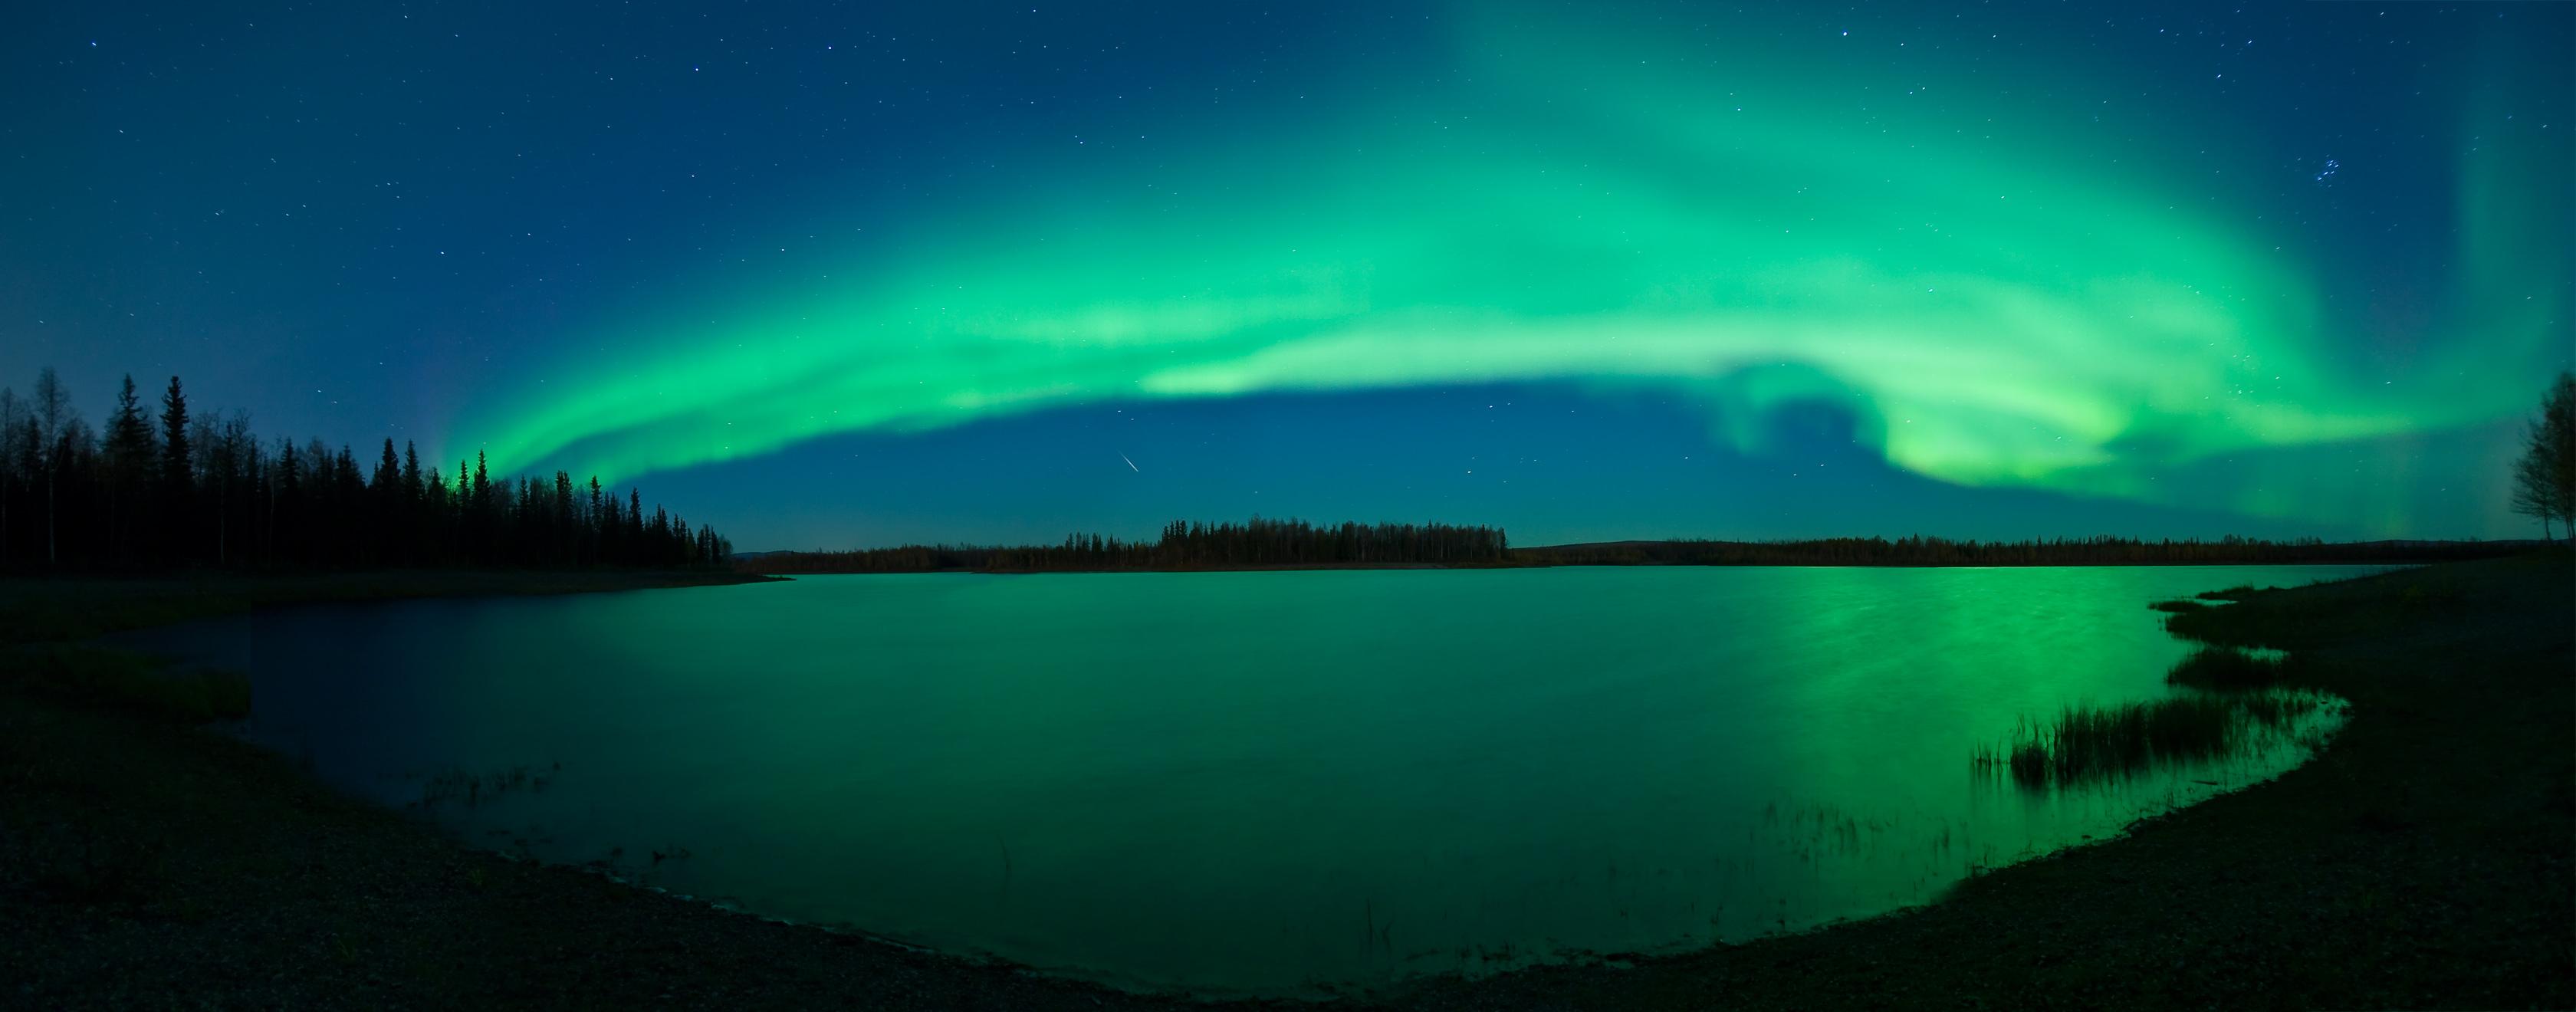 https://i1.wp.com/antwrp.gsfc.nasa.gov/apod/image/0710/aurora_kuenzli_big.jpg